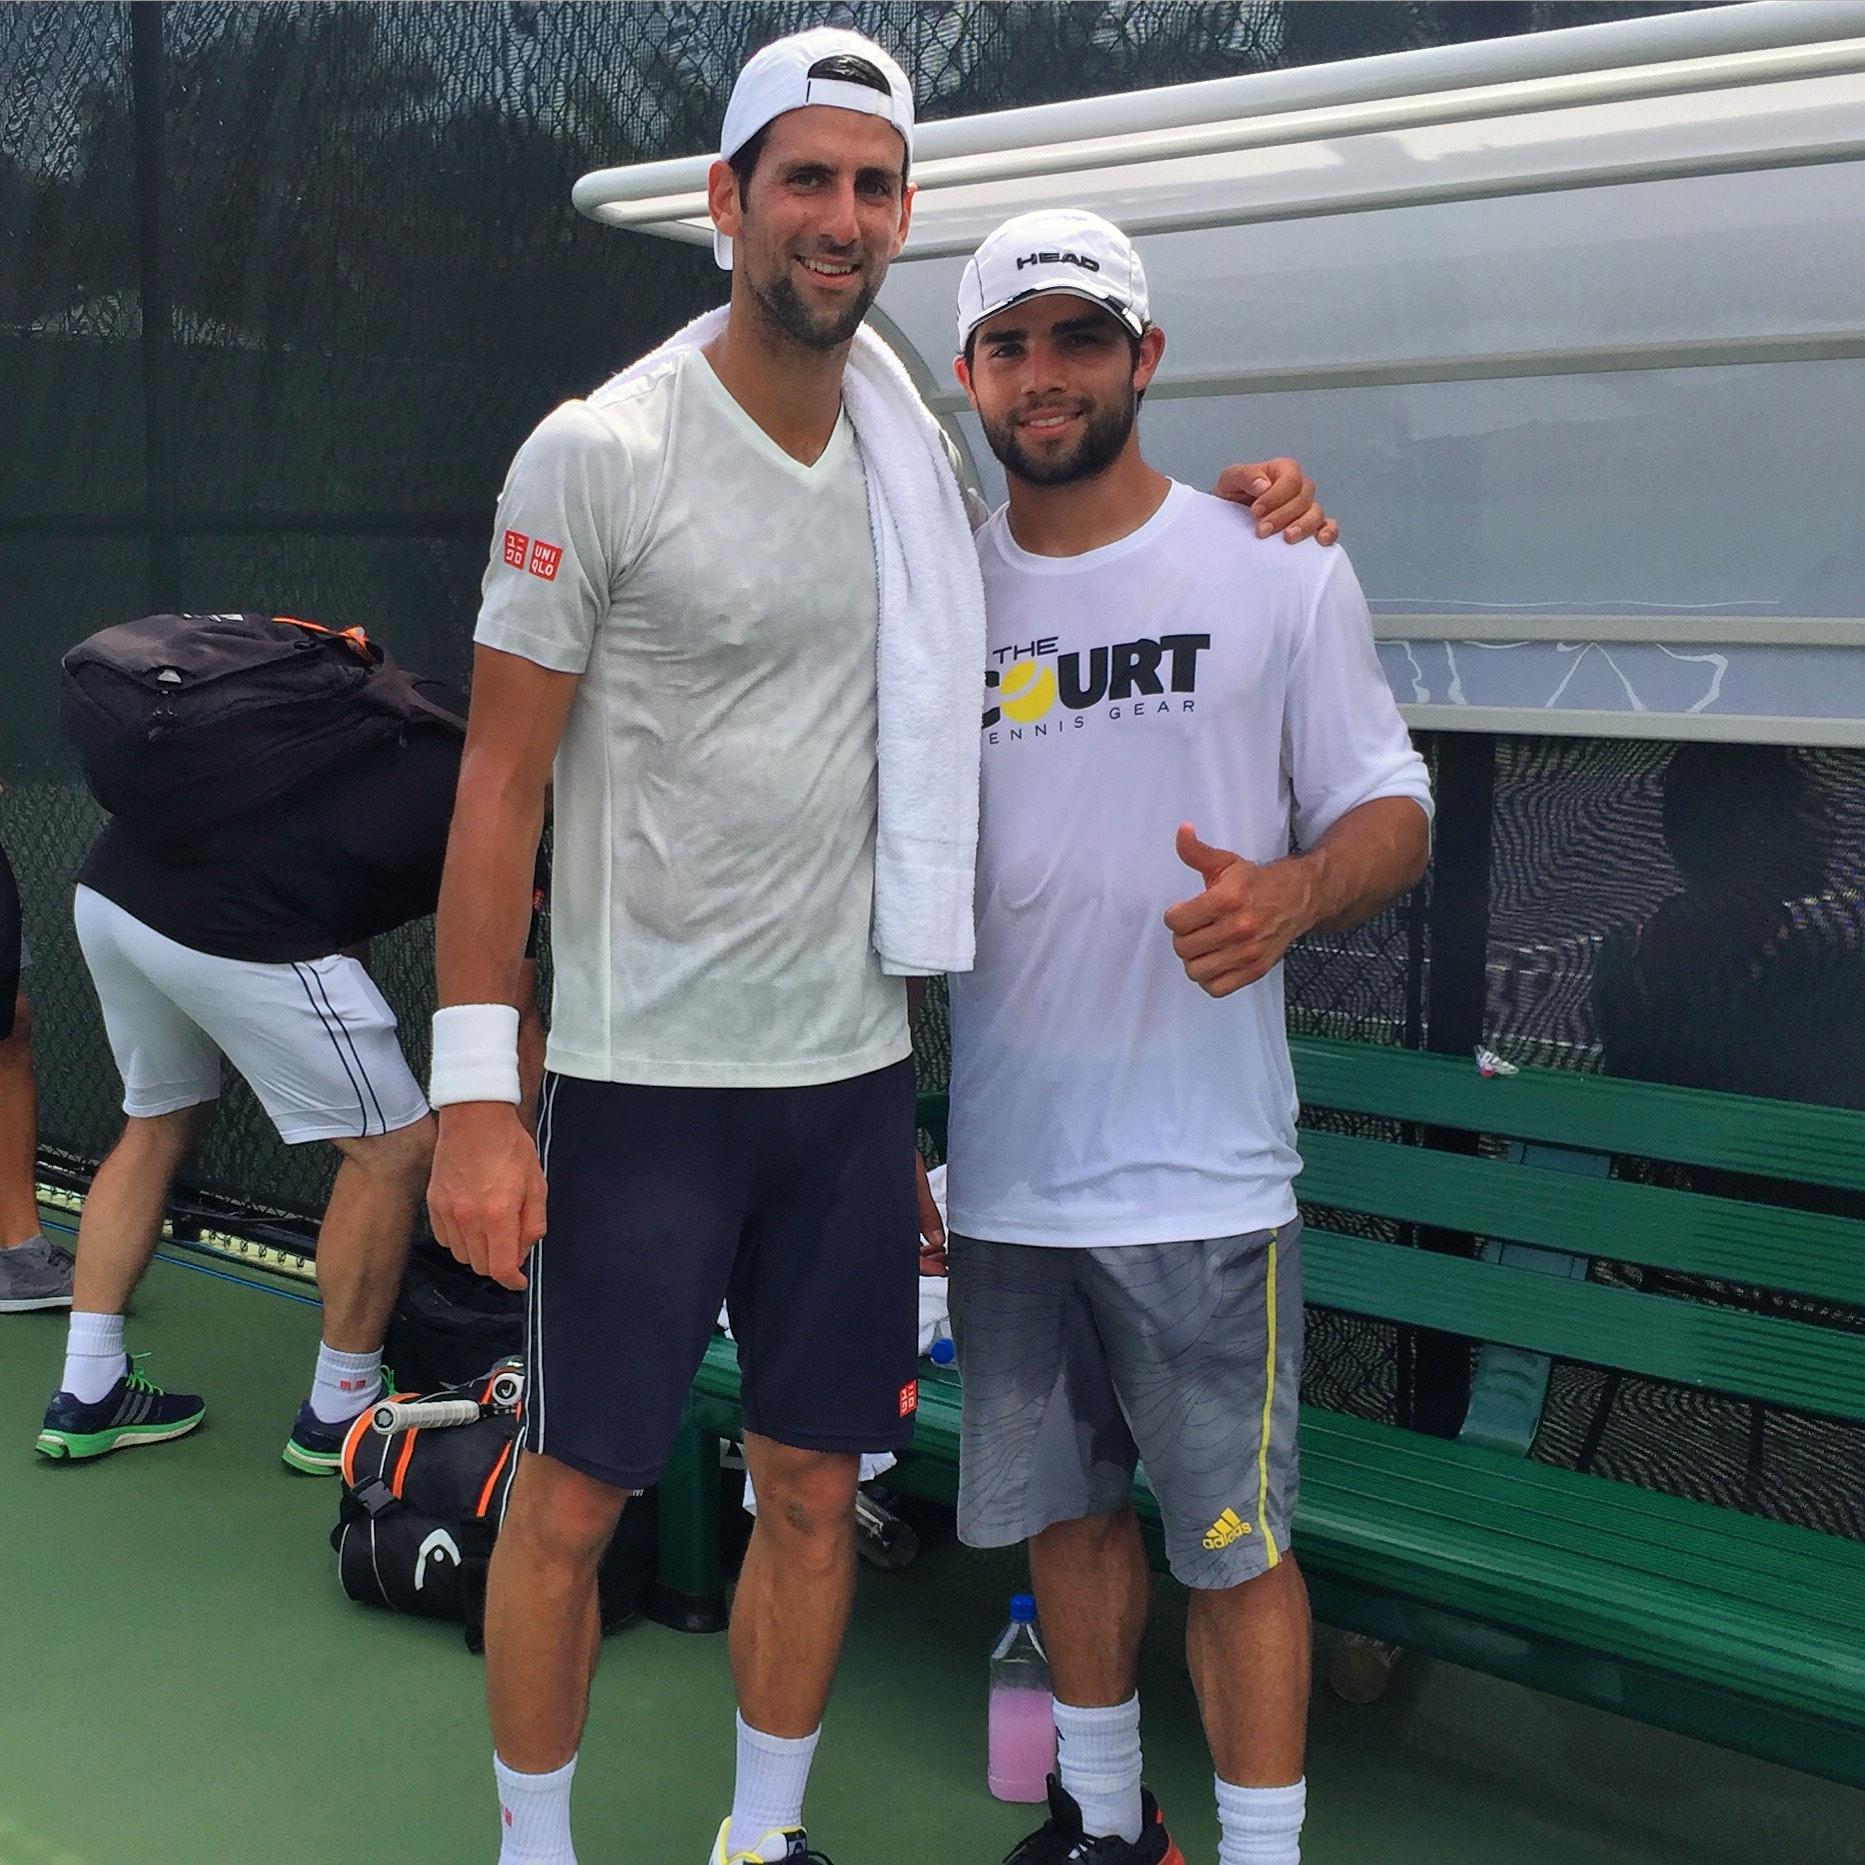 Kurt T. teaches tennis lessons in Key Biscayne, FL